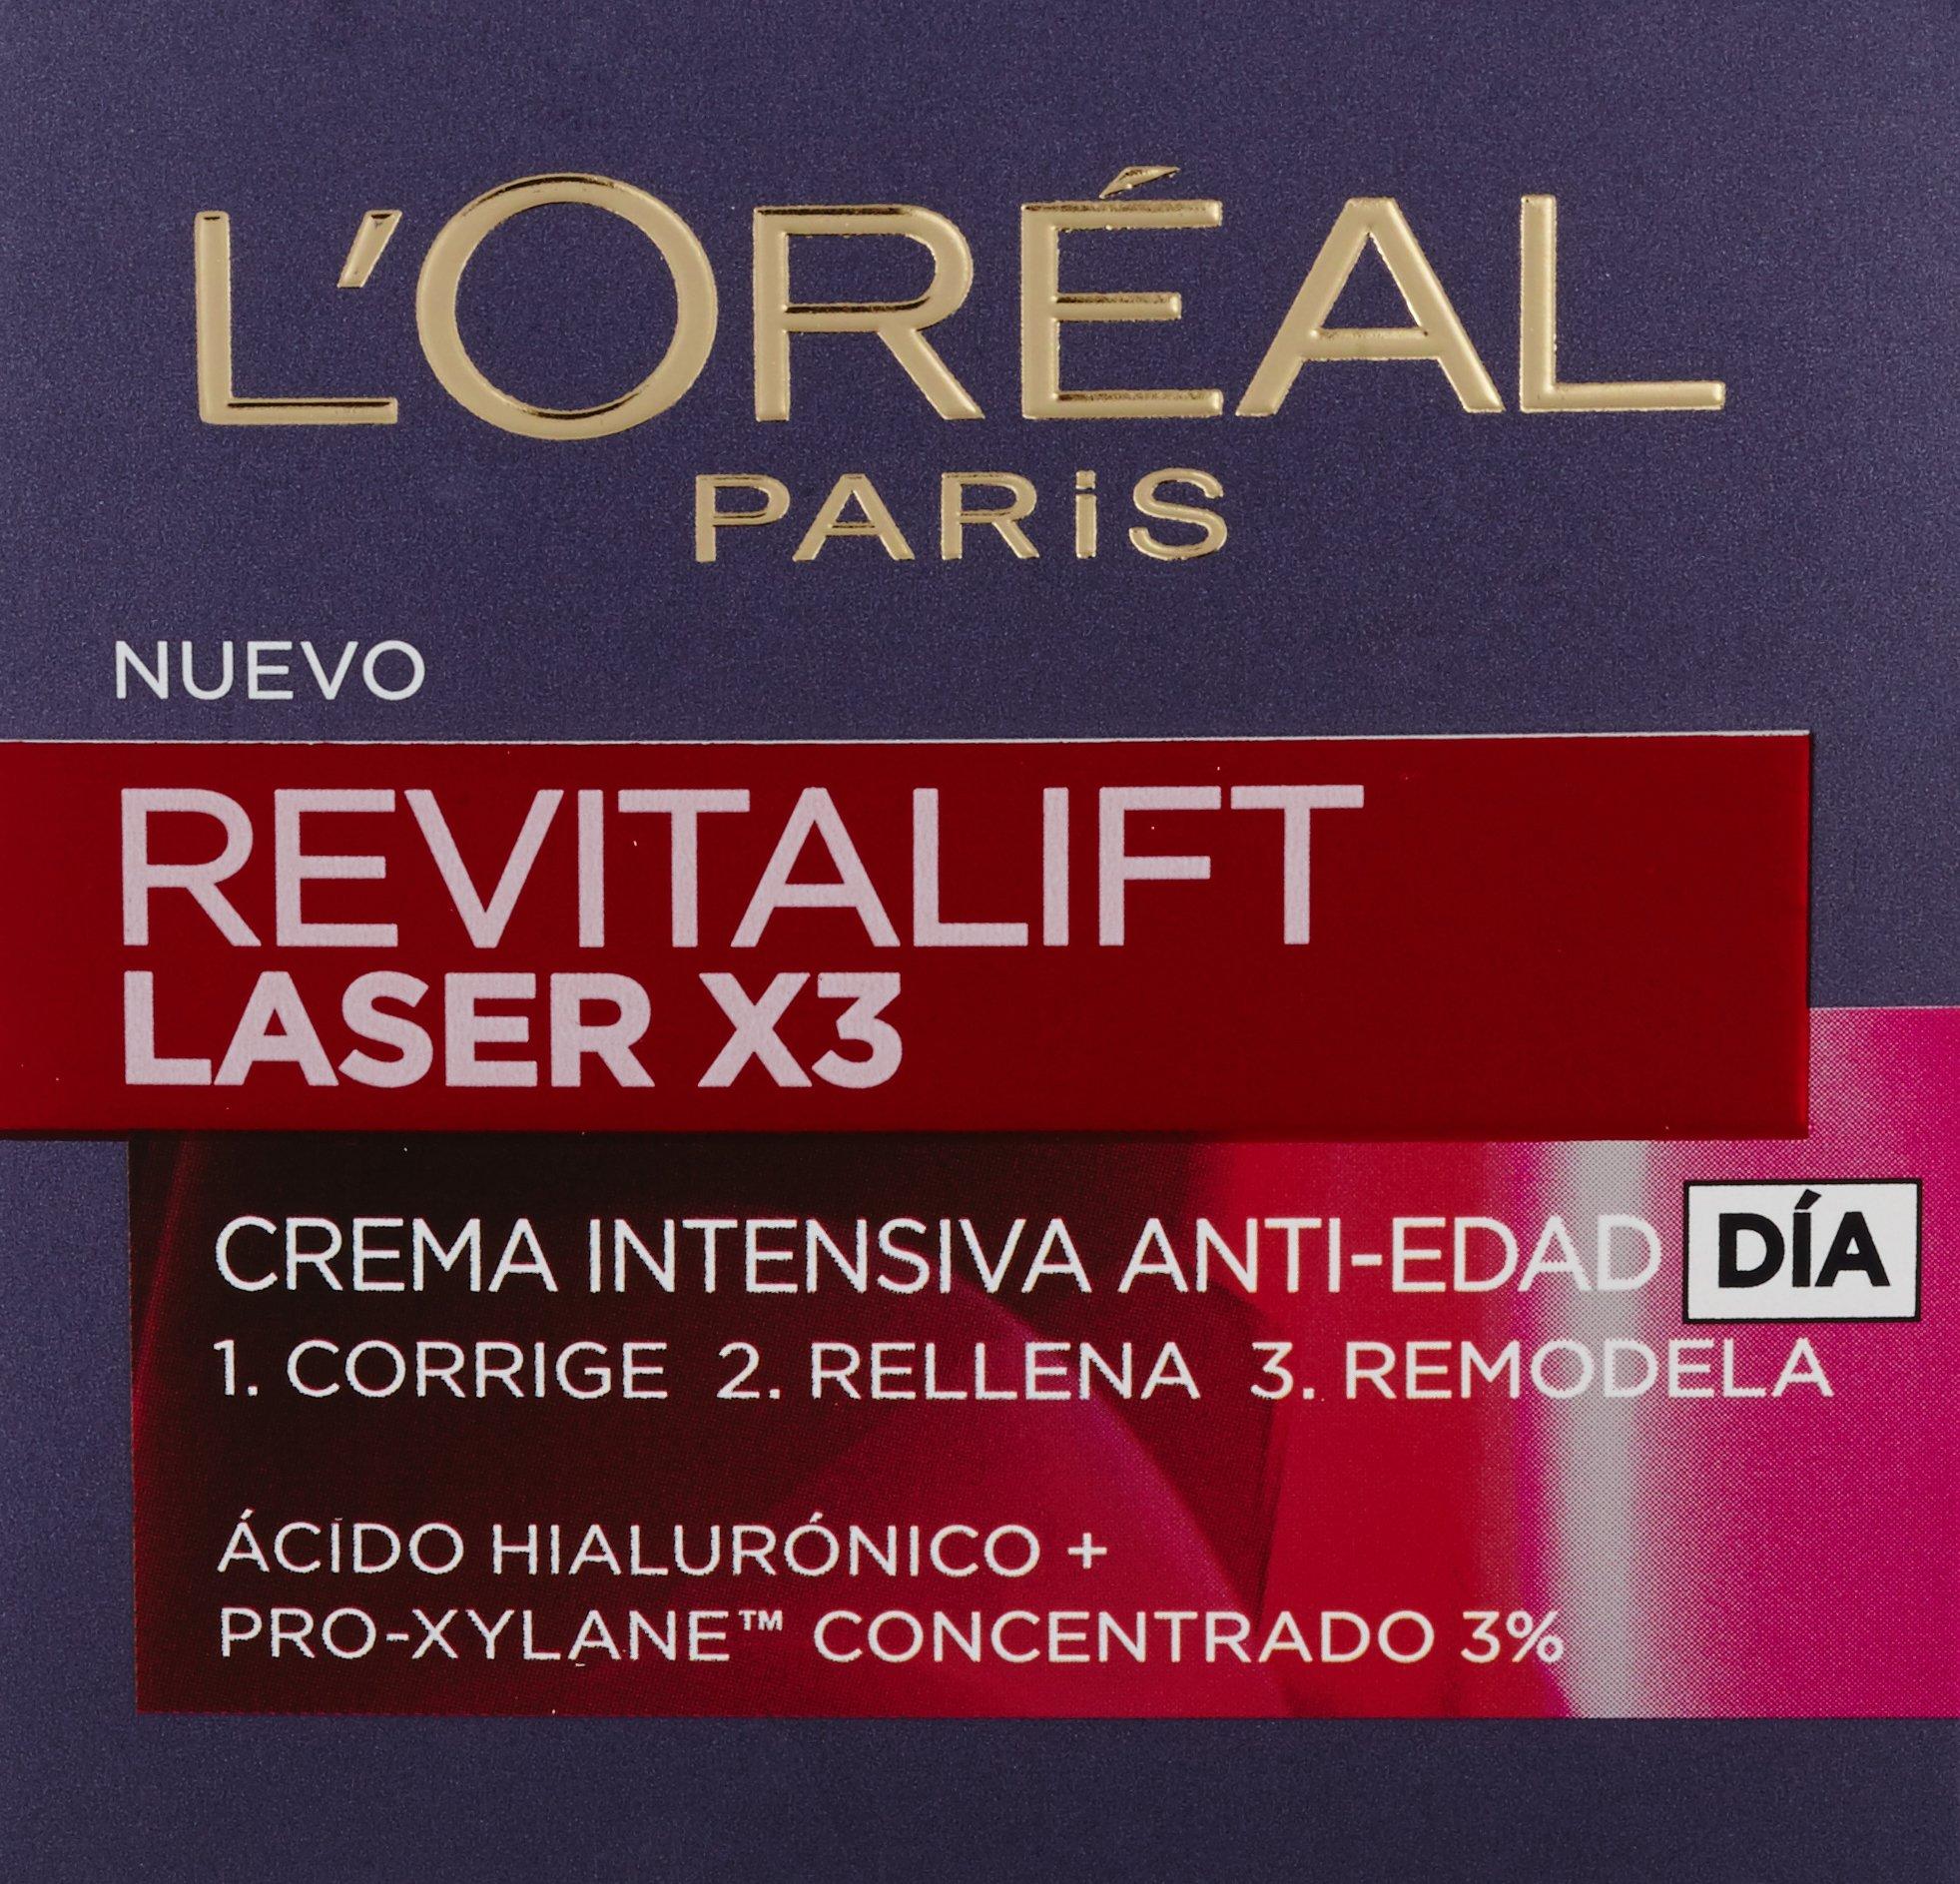 L'Oreal Paris Revitalift Láser x3 Crema de Día Intensiva Anti-Edad – 50 ml